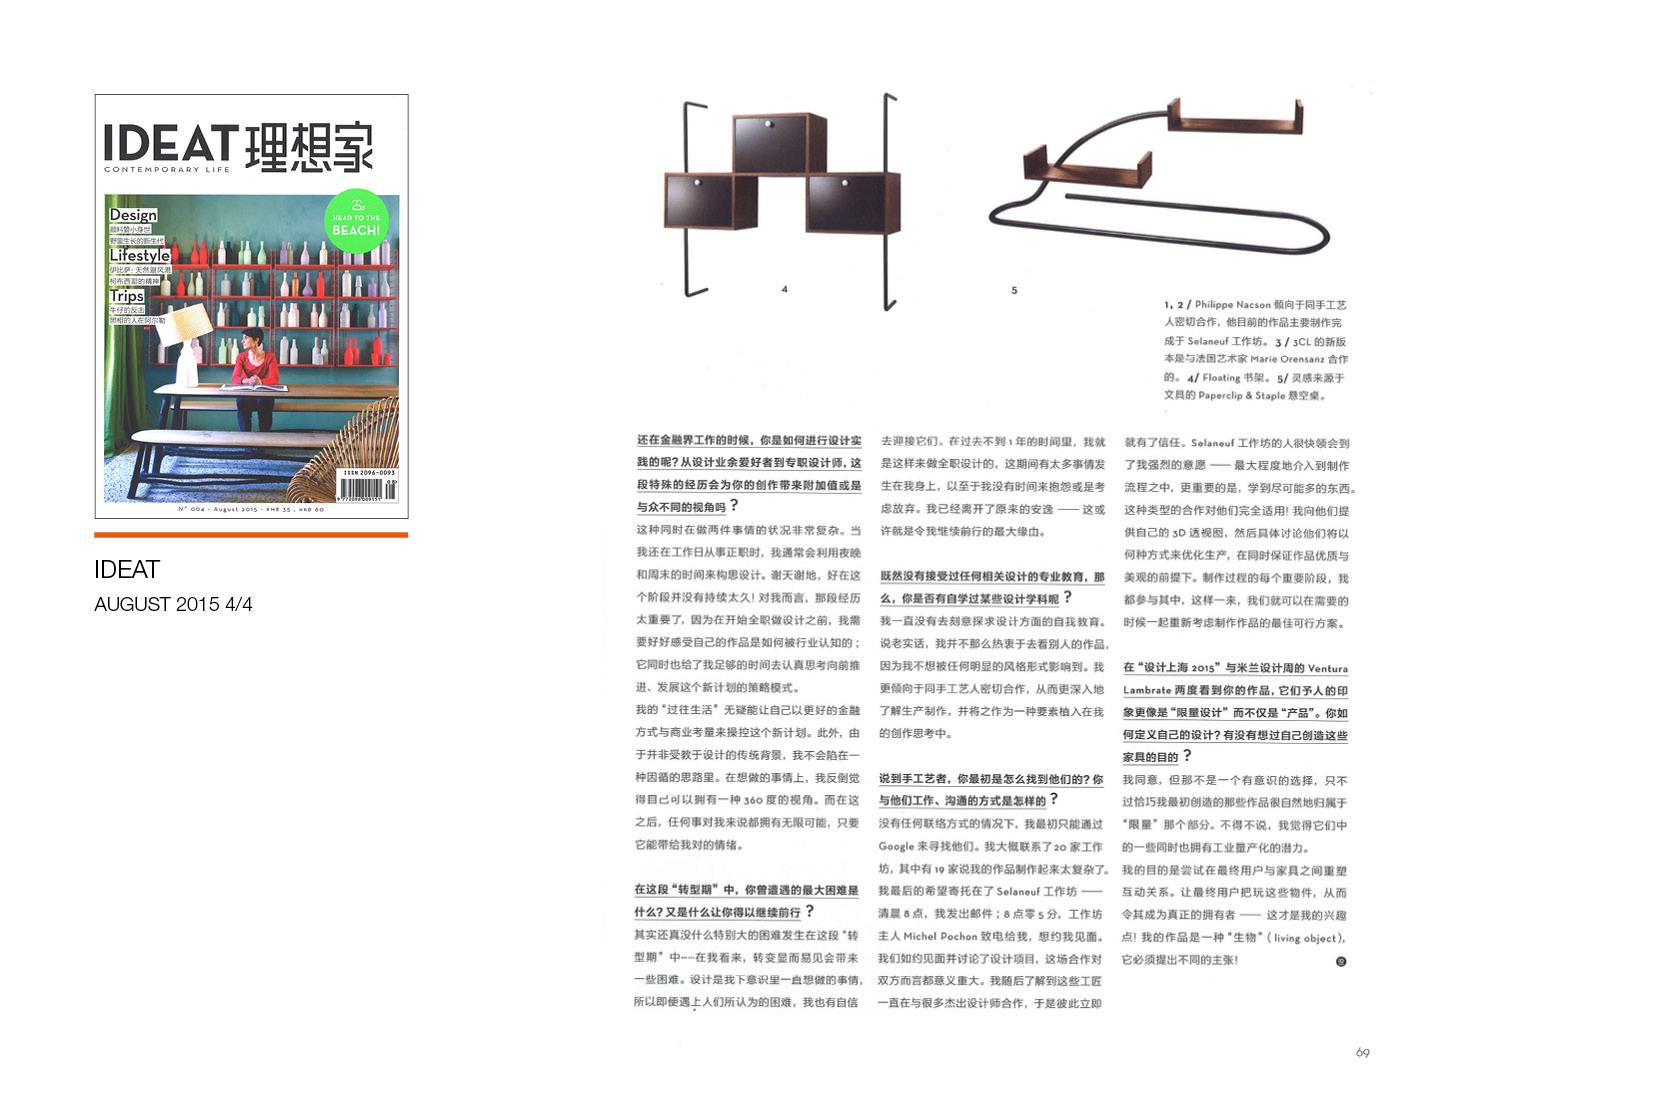 Dossier de Presse Nacson - ideat4.jpg